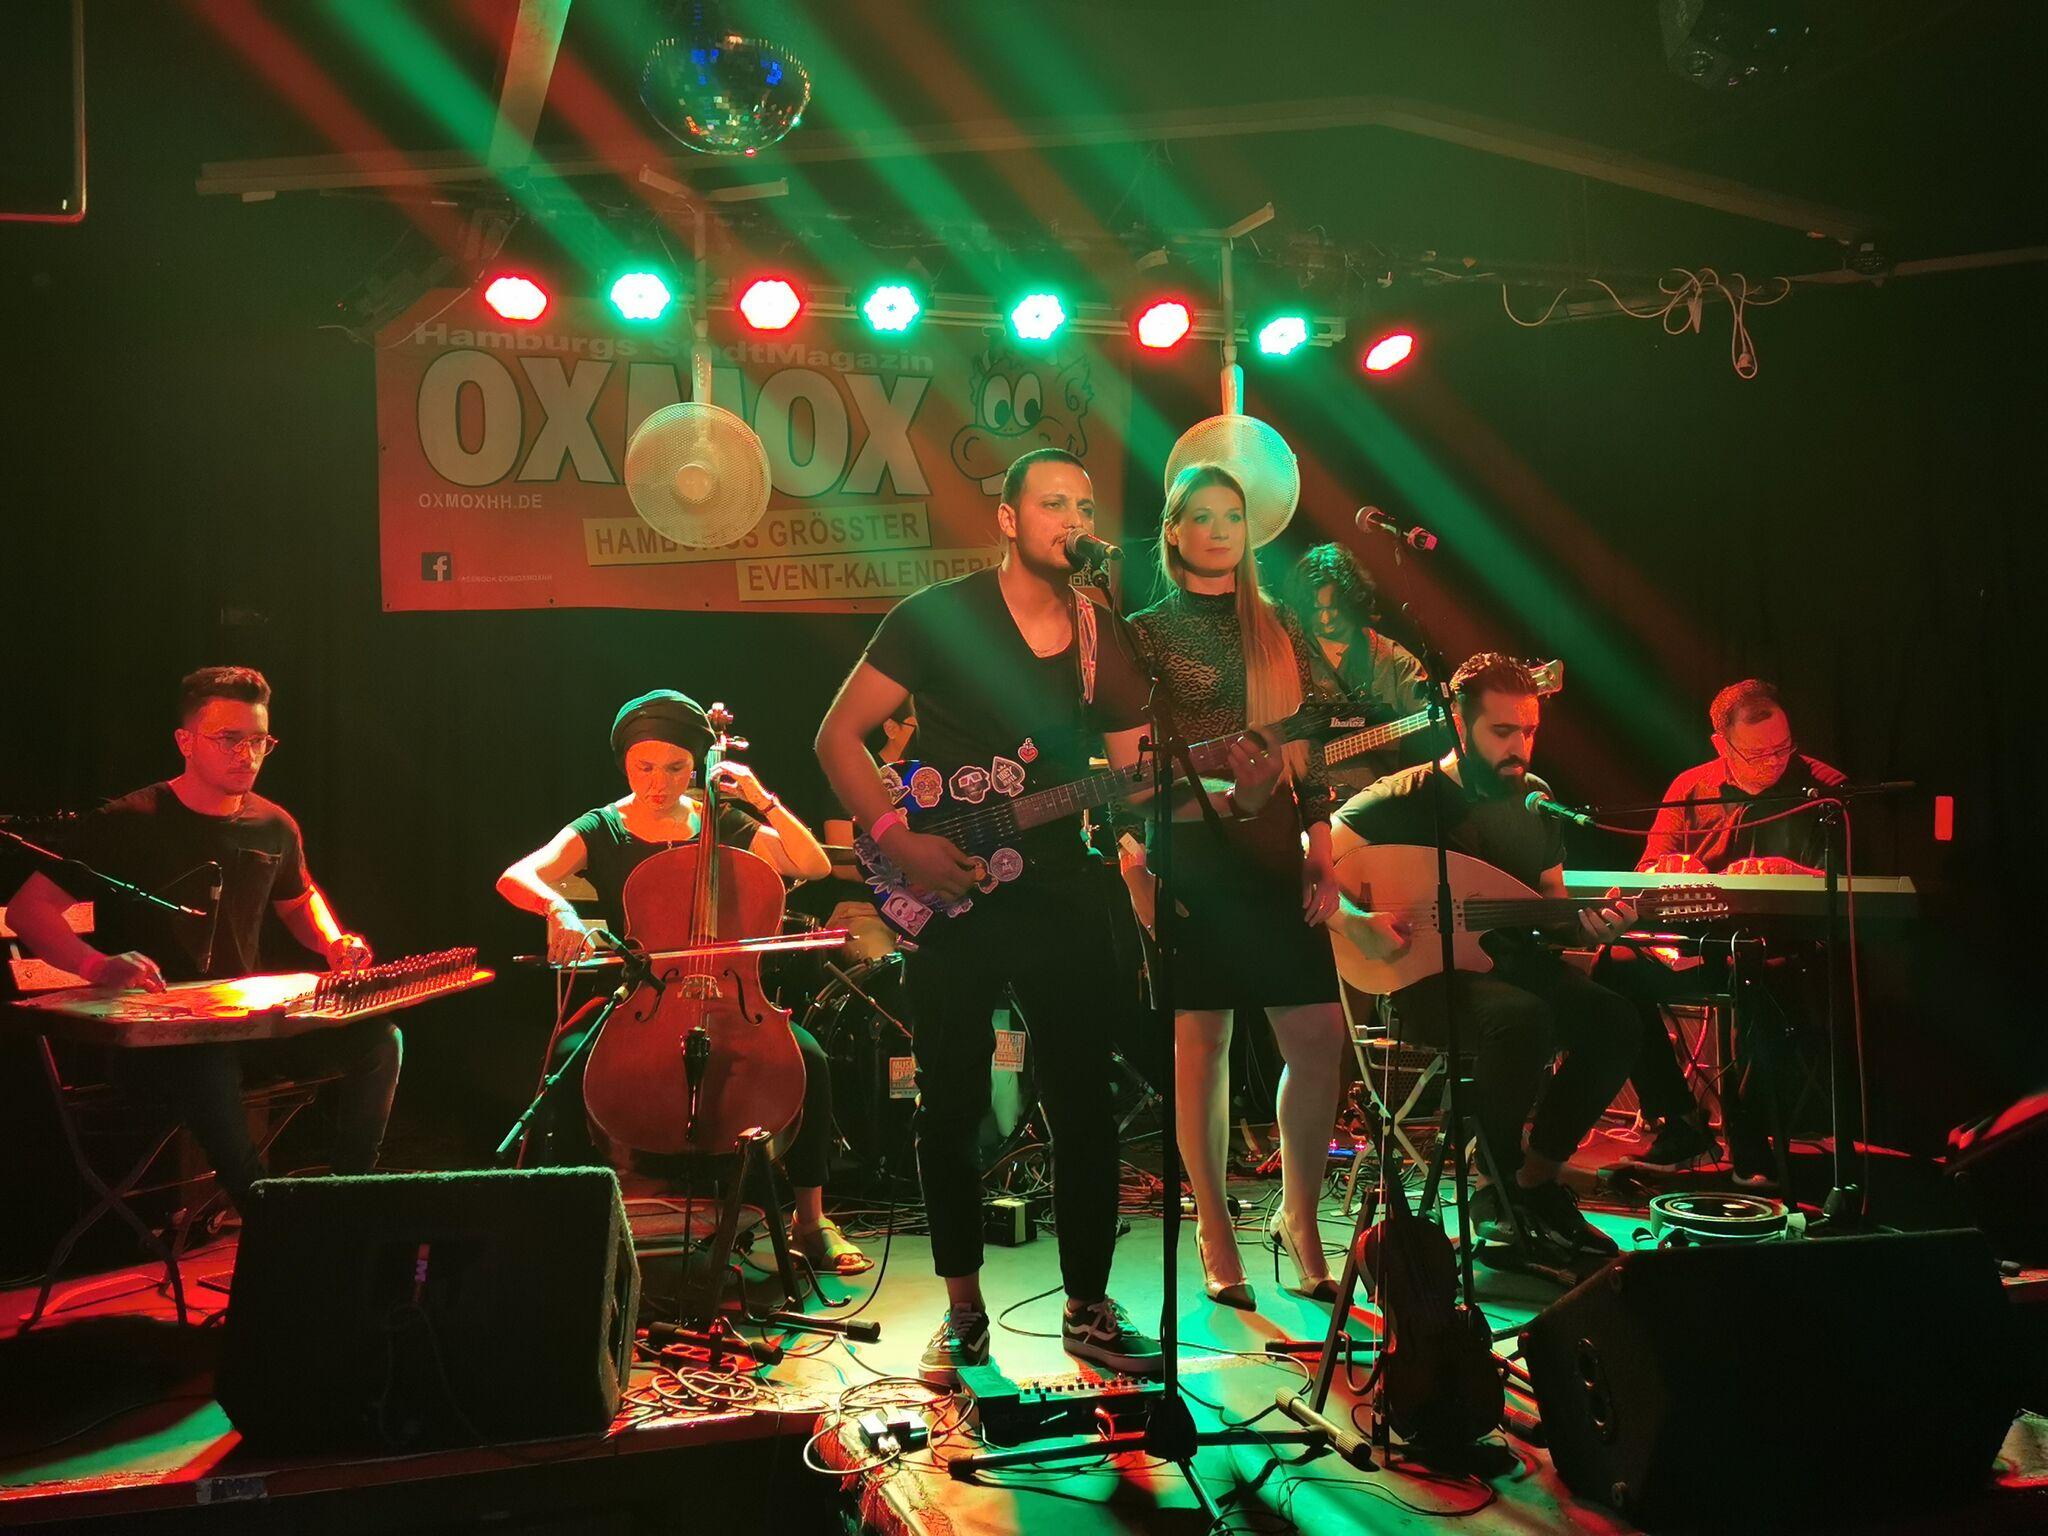 Mirage Band 8 - 34. HAMBURG-BANDCONTEST – DAS HALBFINALE (2/2)